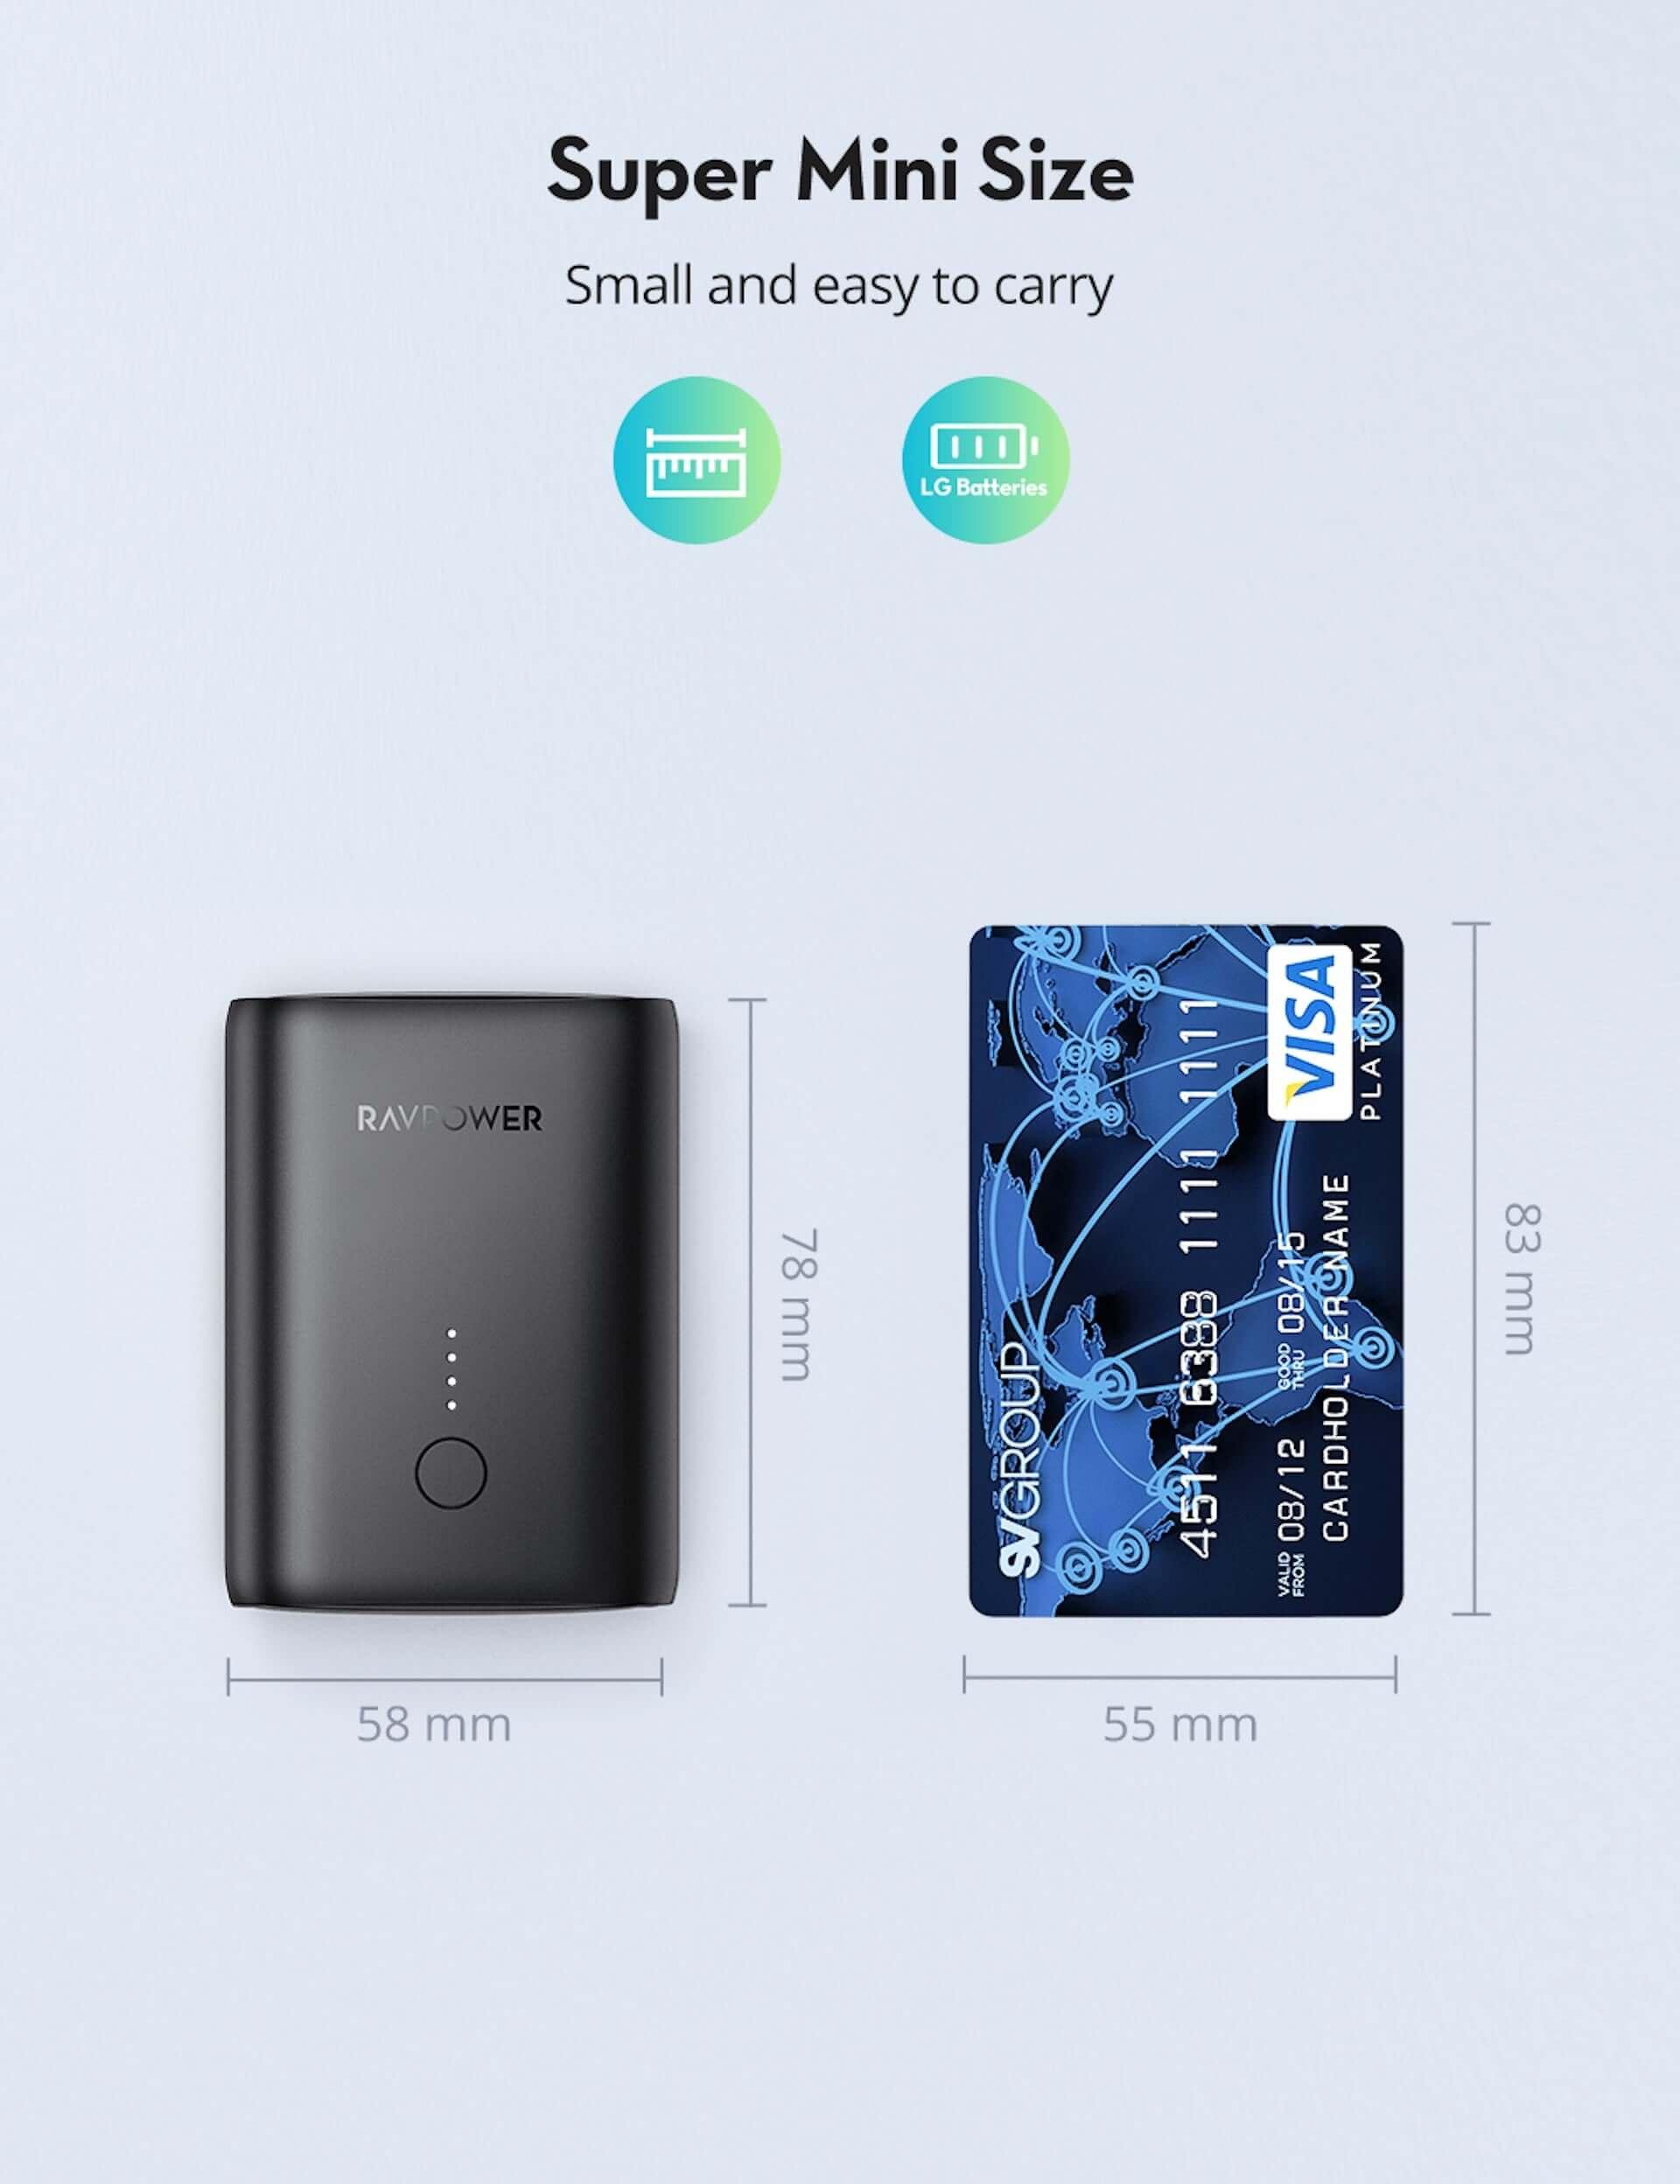 10000mAhの大容量モバイルバッテリーがRAVPowerから発売中!名刺入れやカードよりも小さいサイズ tech200727_ravpower_04-1920x2496